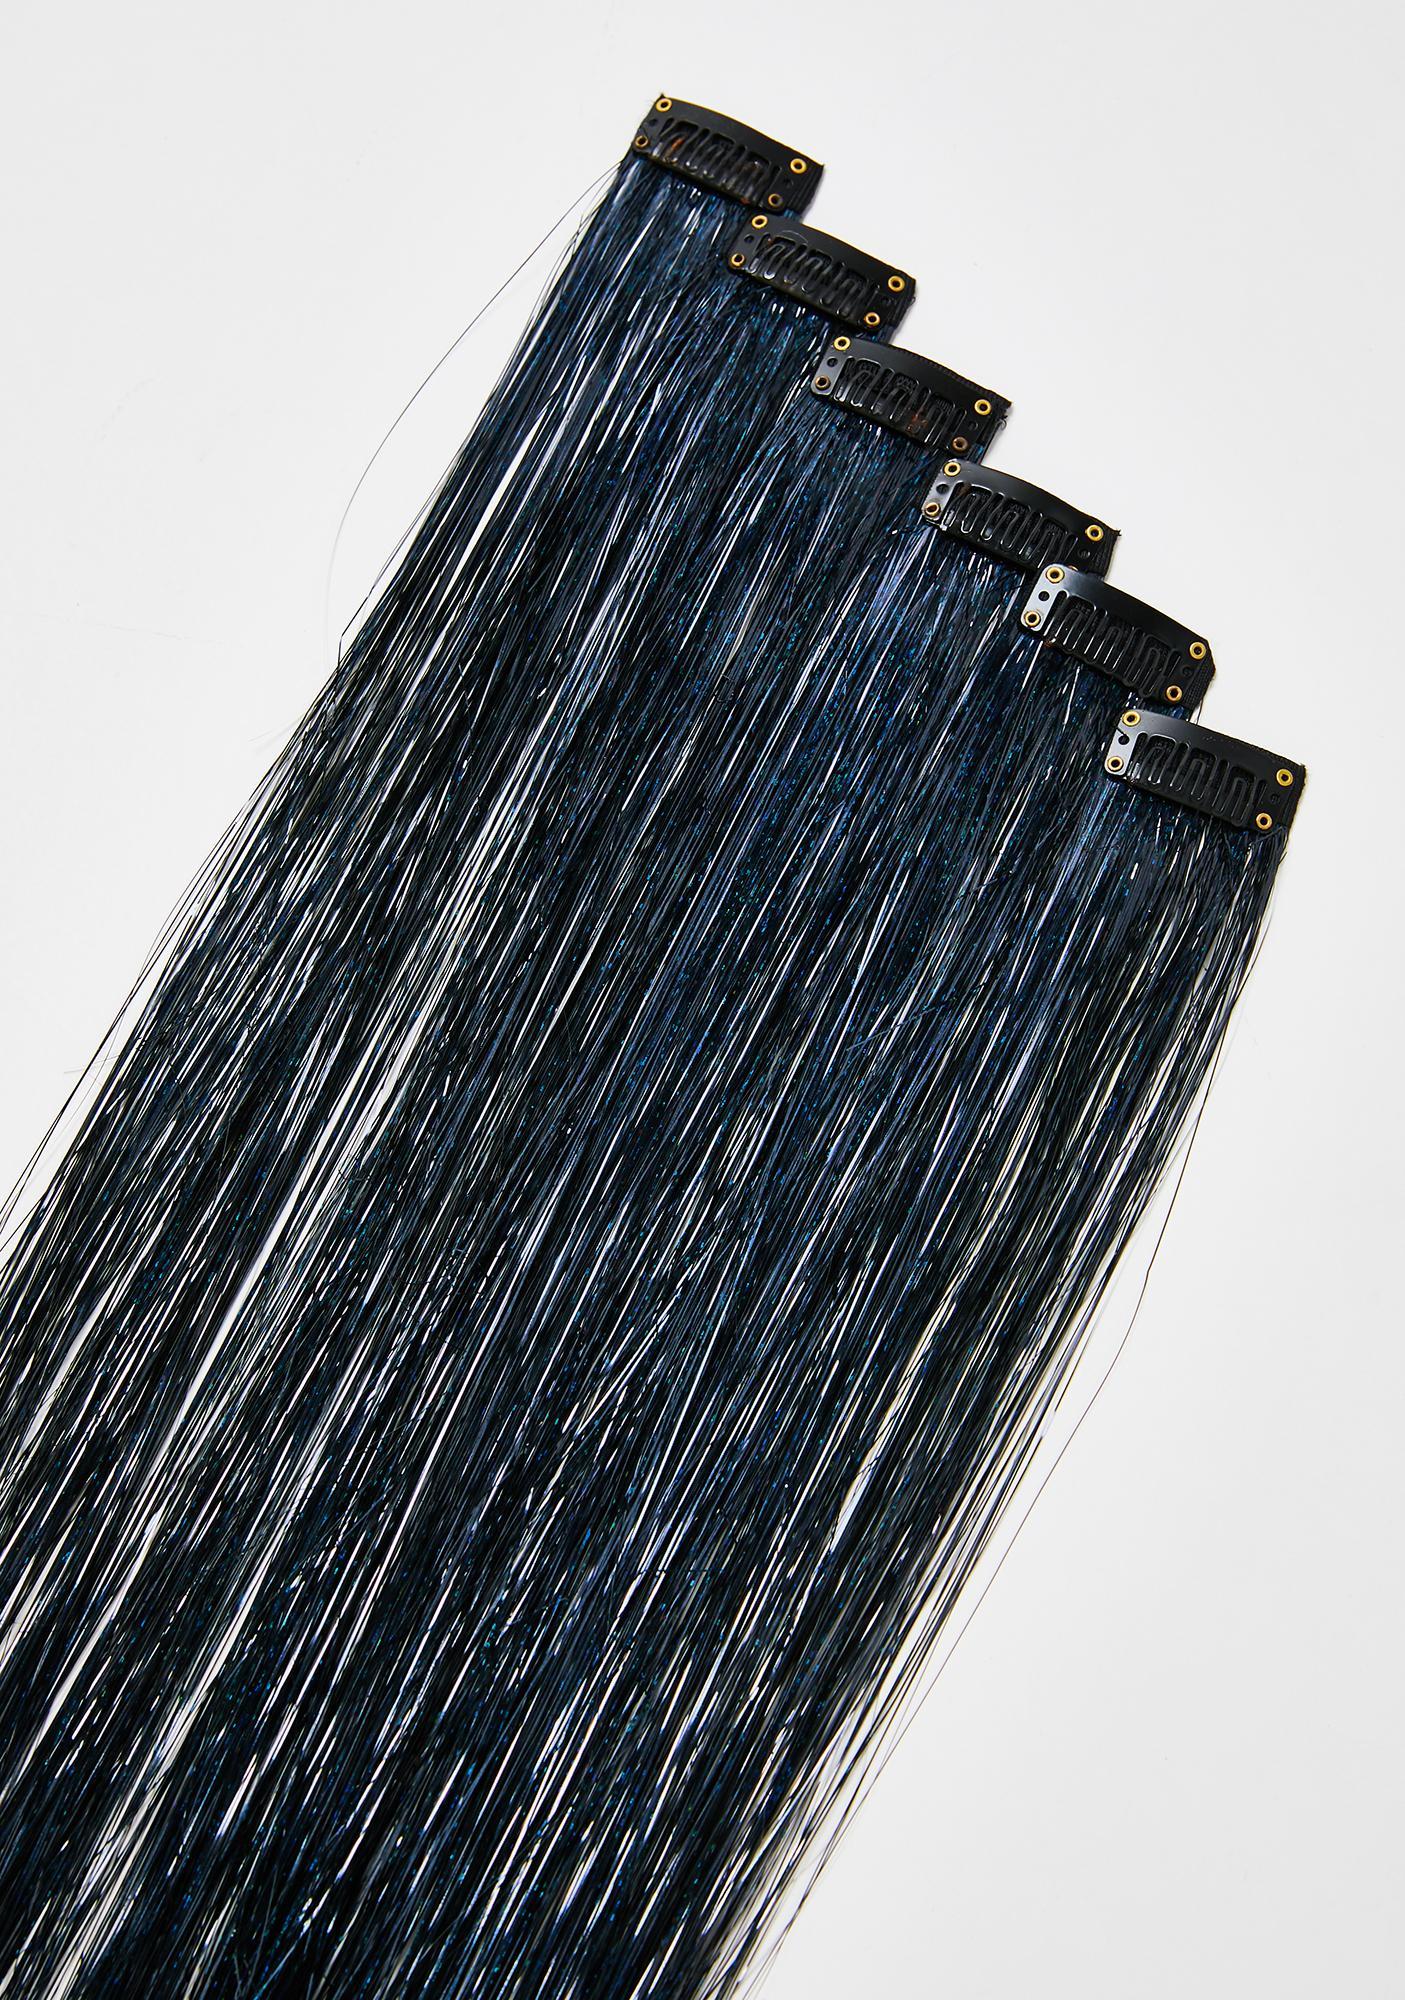 SHRINE Black Tinsel Hair Extensions